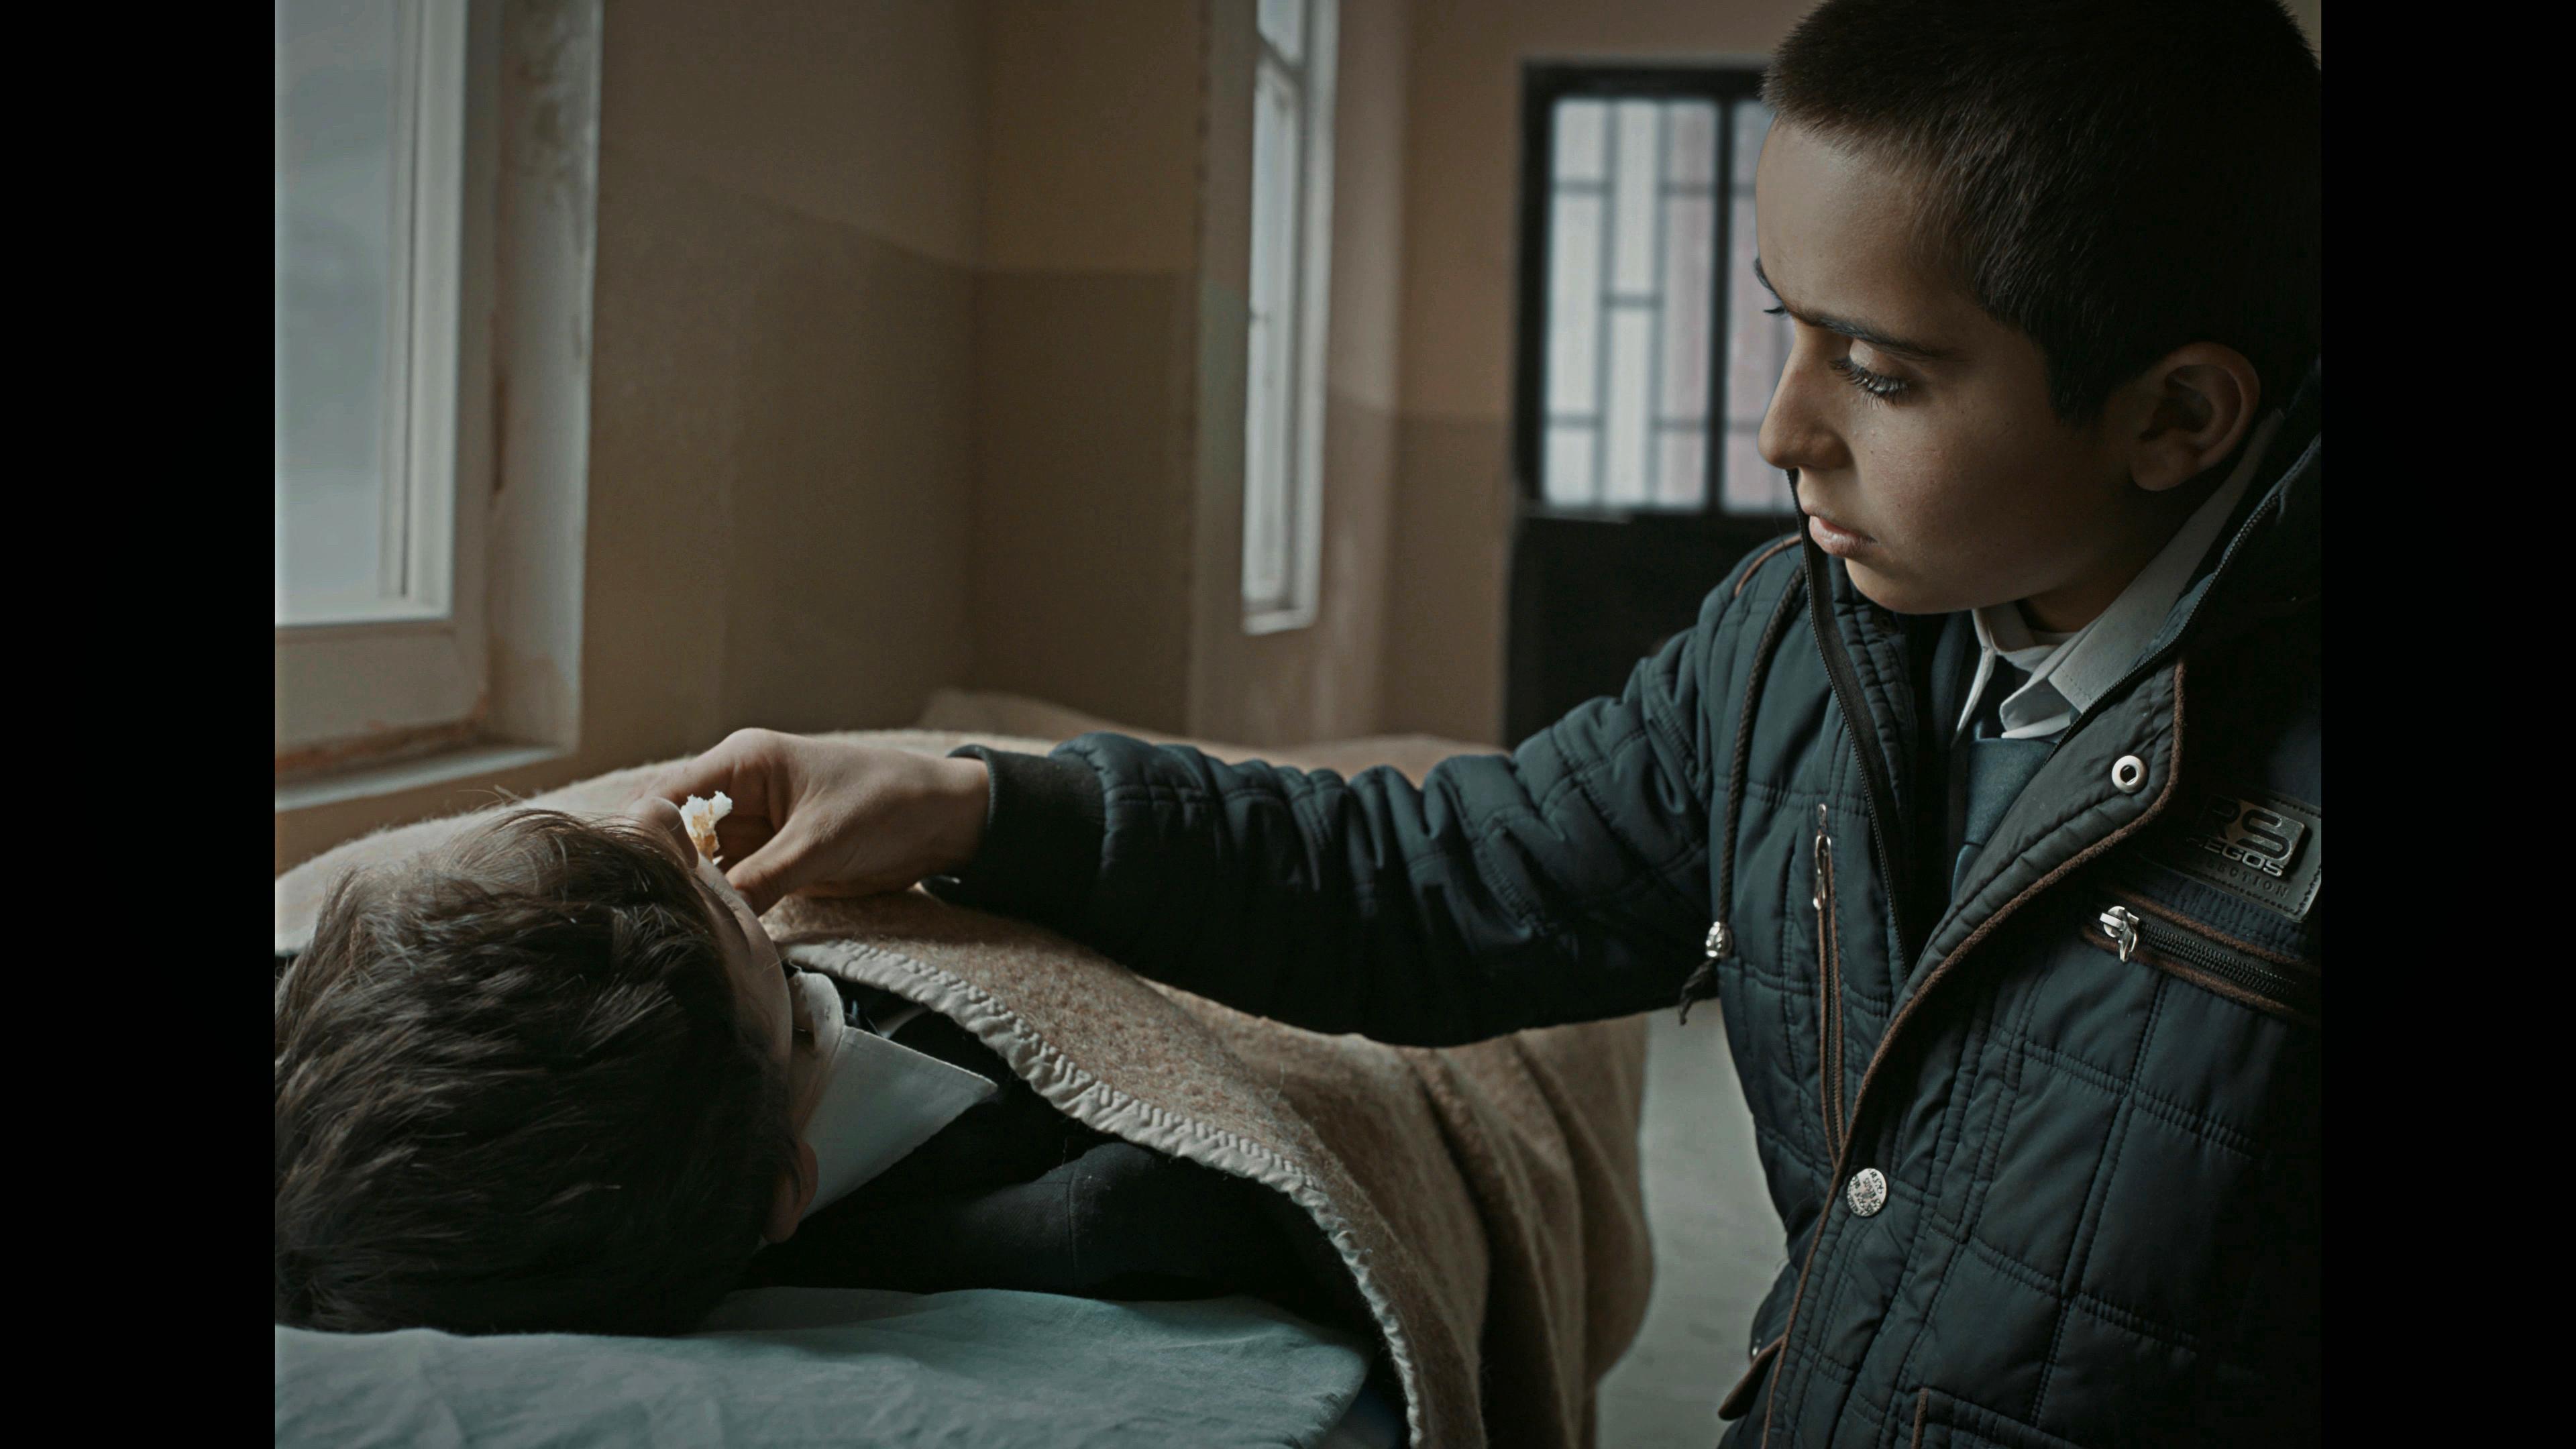 OKUL-TIRASI-BROTHER-S-KEEPER-03-Asteros-Film-2021-Photo-Turksoy-Golebeyi